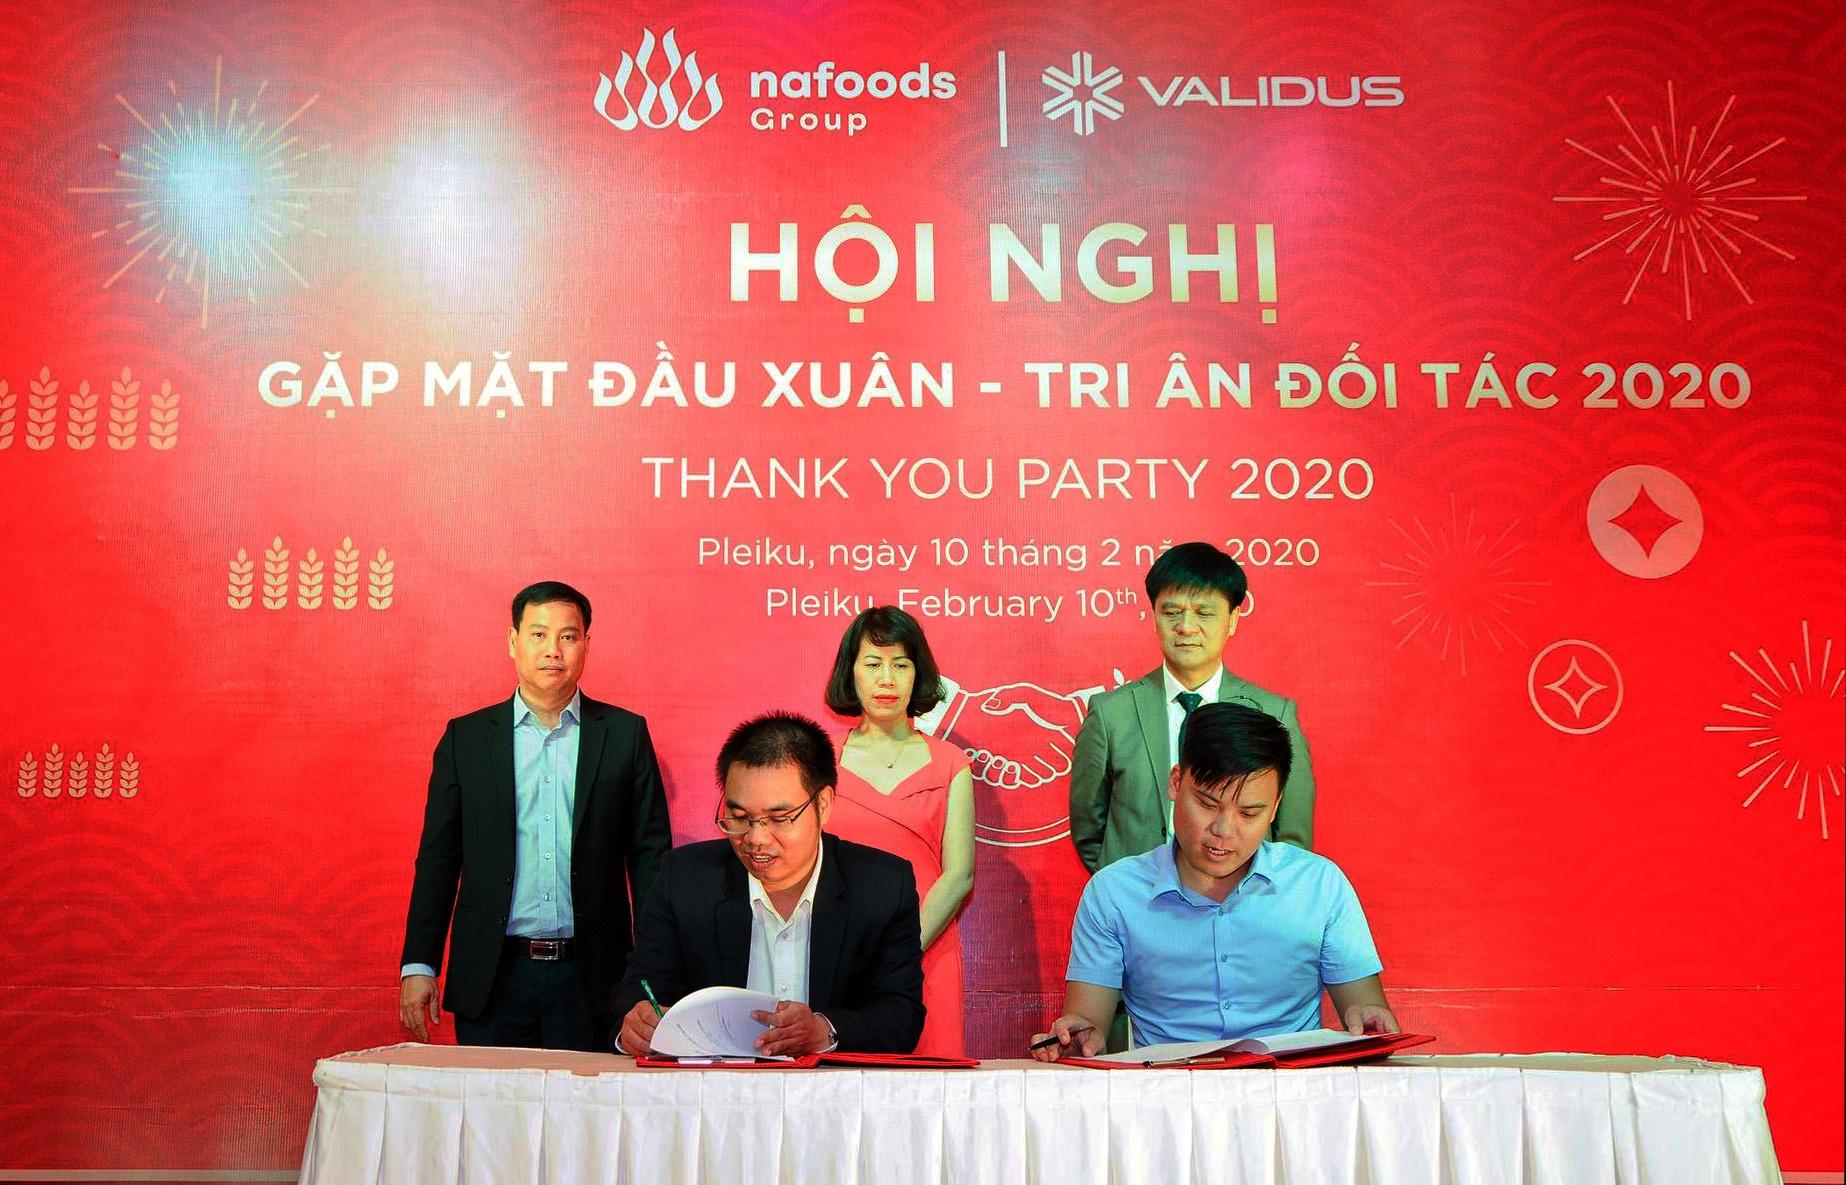 validus viet nam hop tac voi nafoods group de thuc day ho tro tai chinh cho nganh nong nghiep